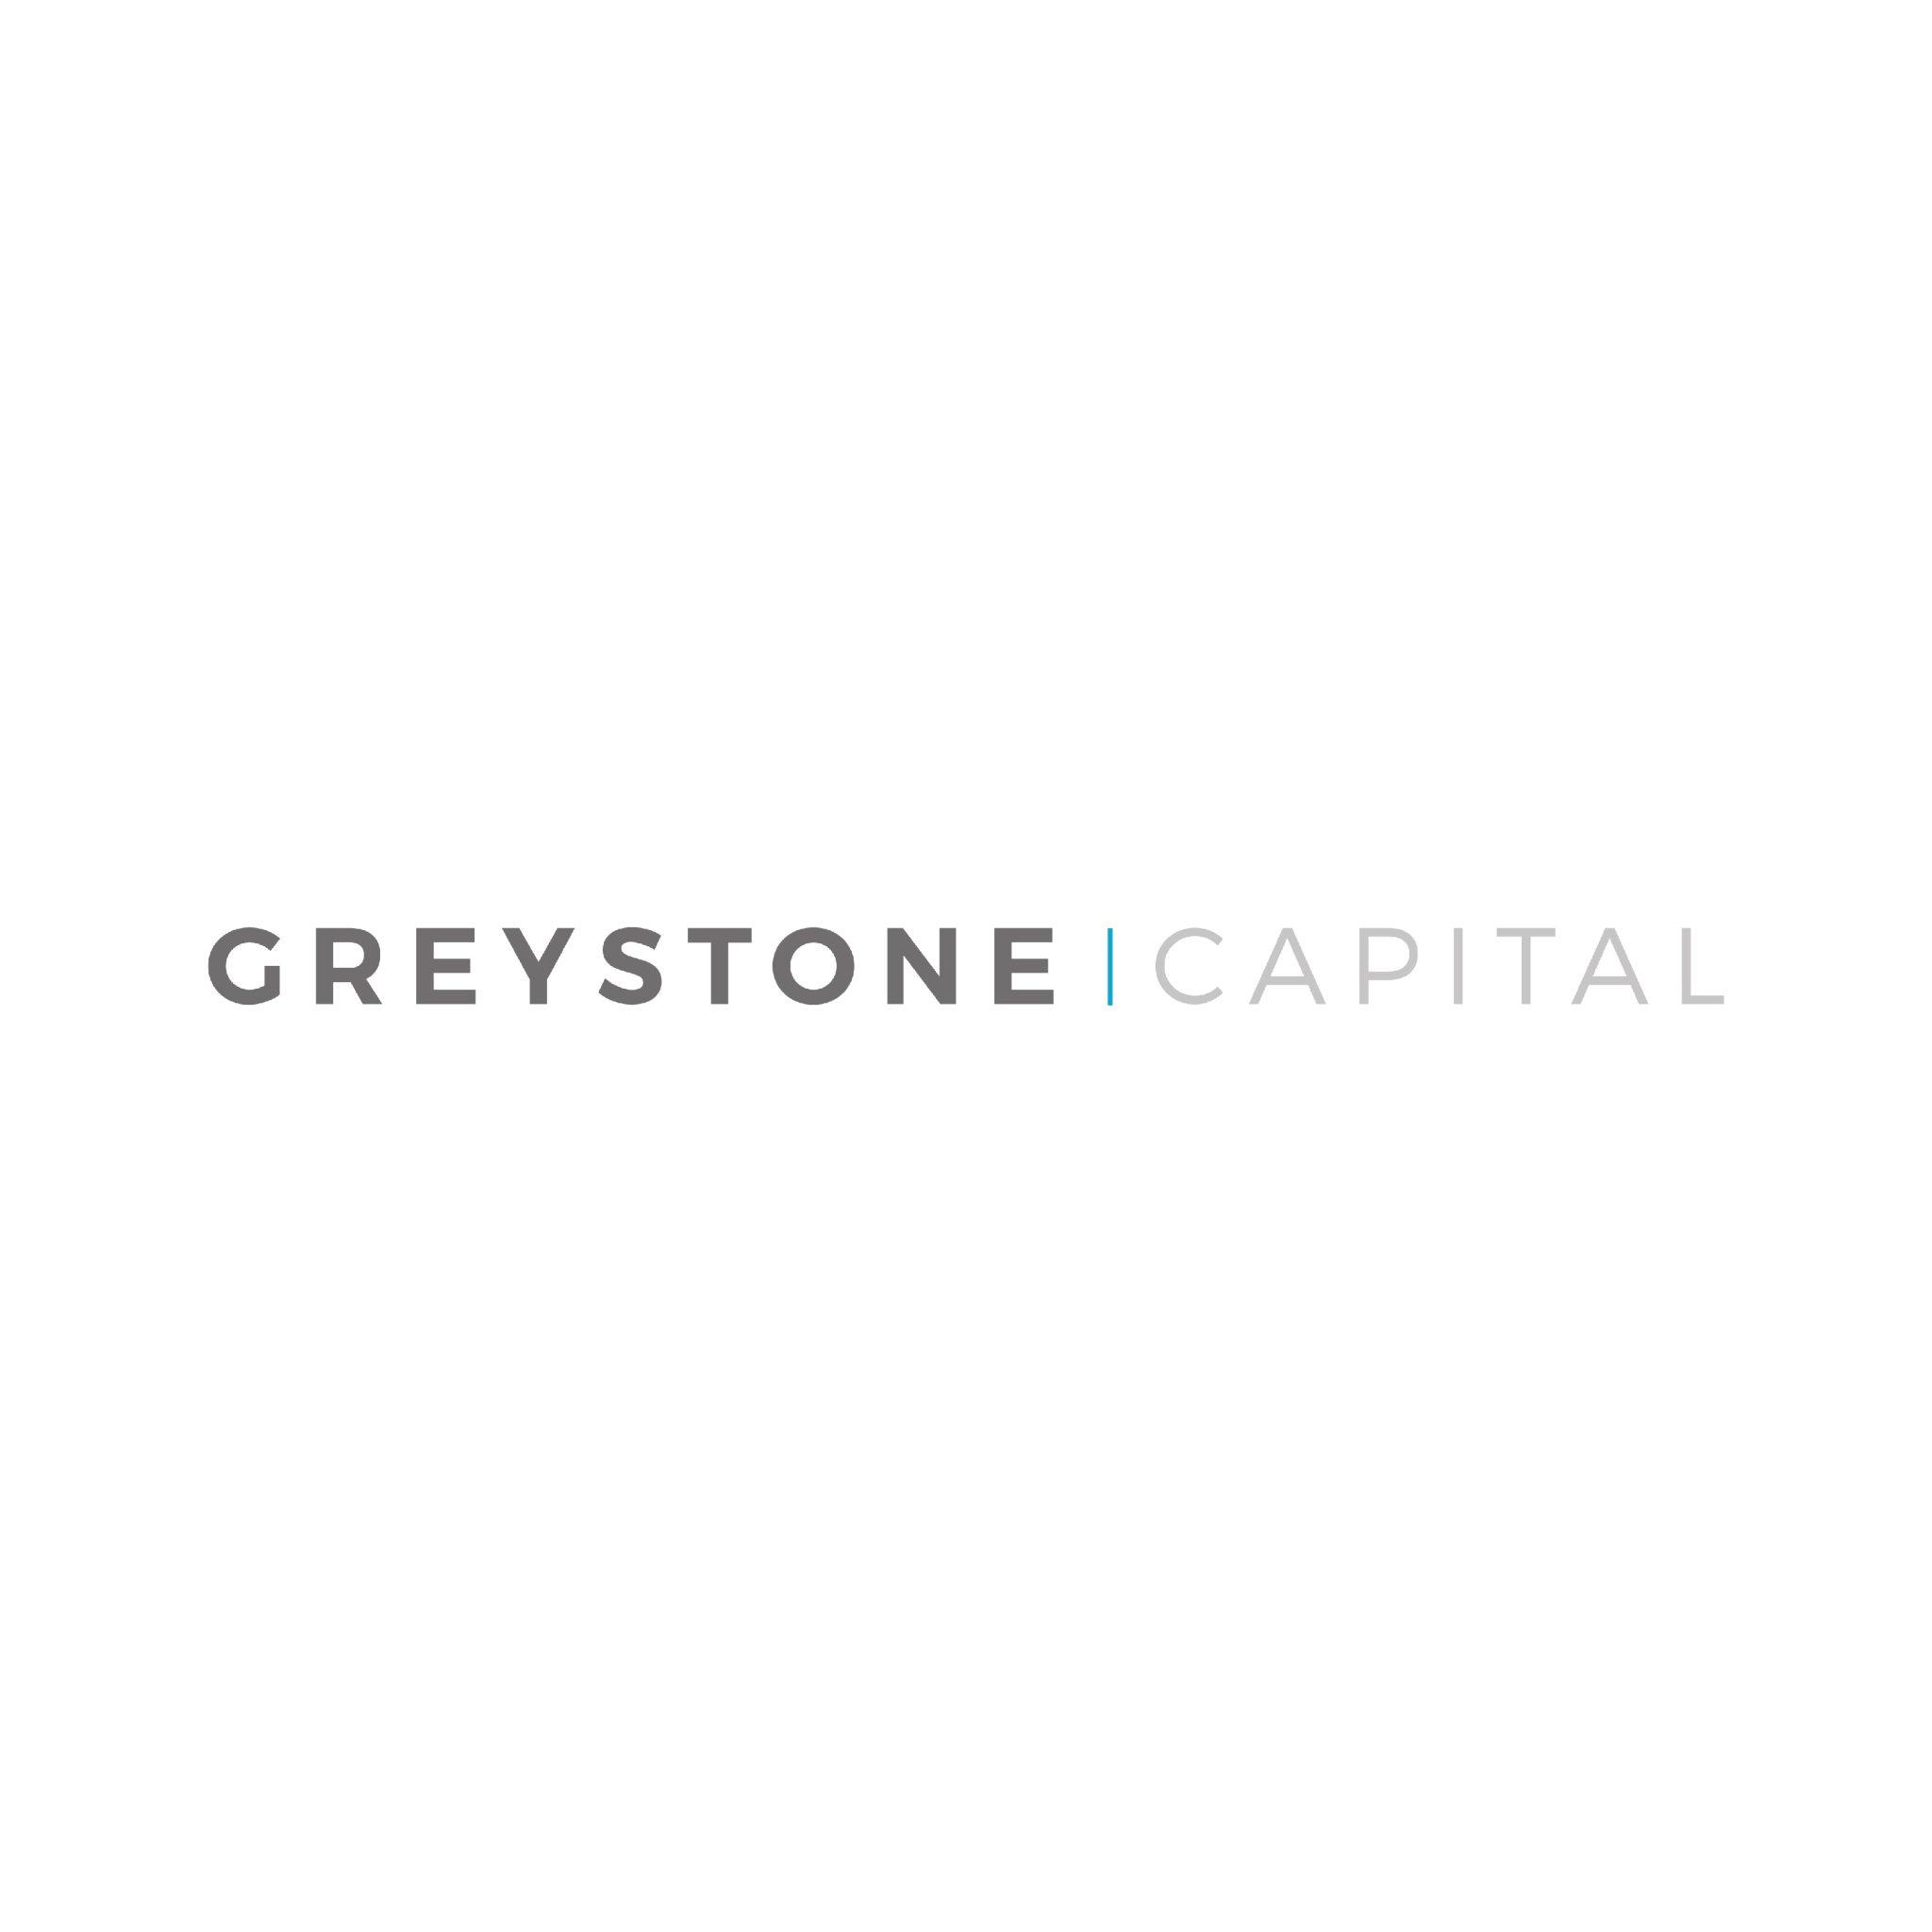 Greystone Capital